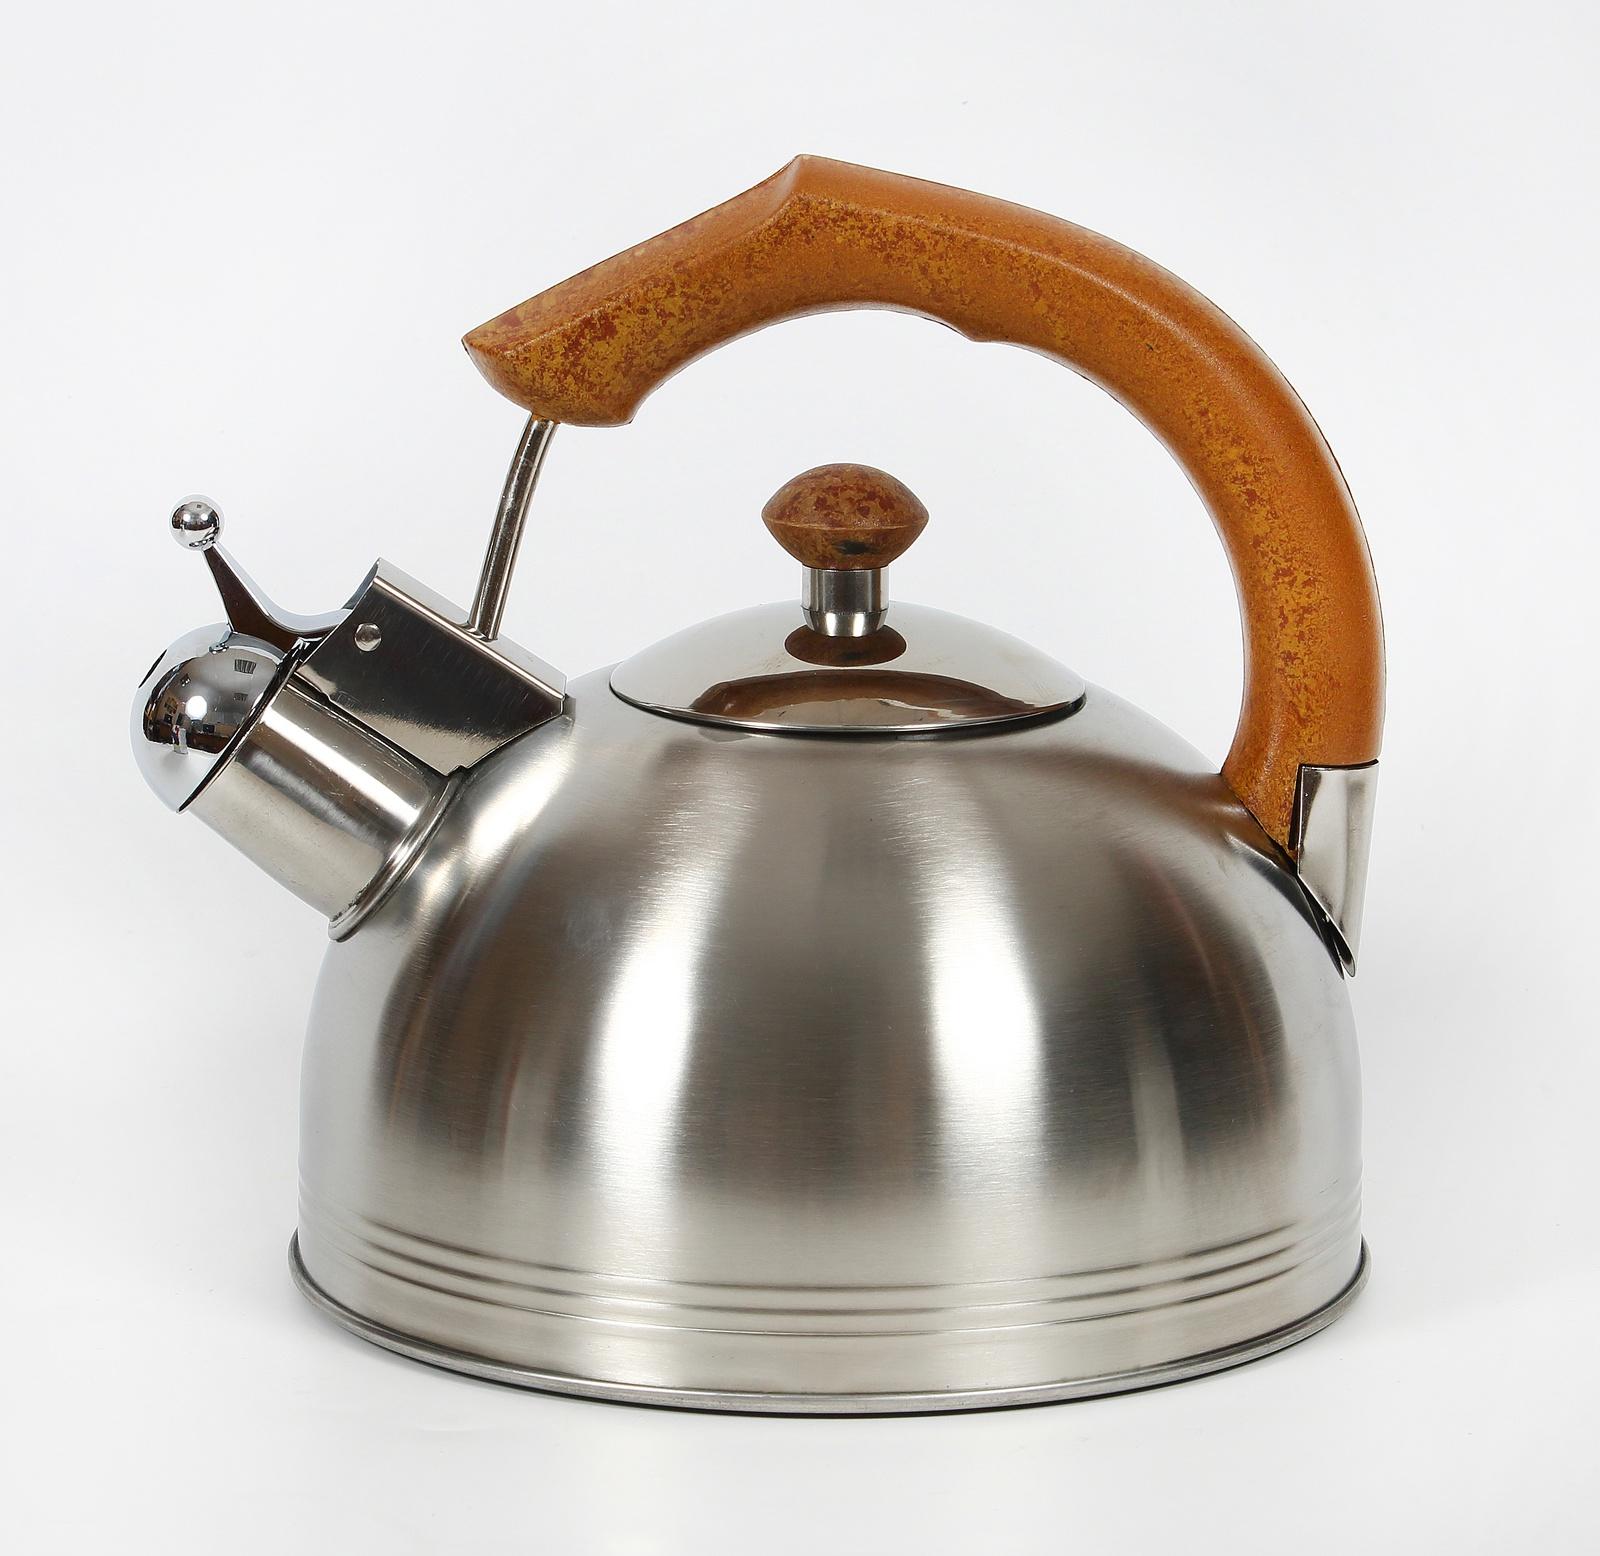 Чайник КС со свистком, 333-RY-10, металлический, коричневый, 2.7 л цена